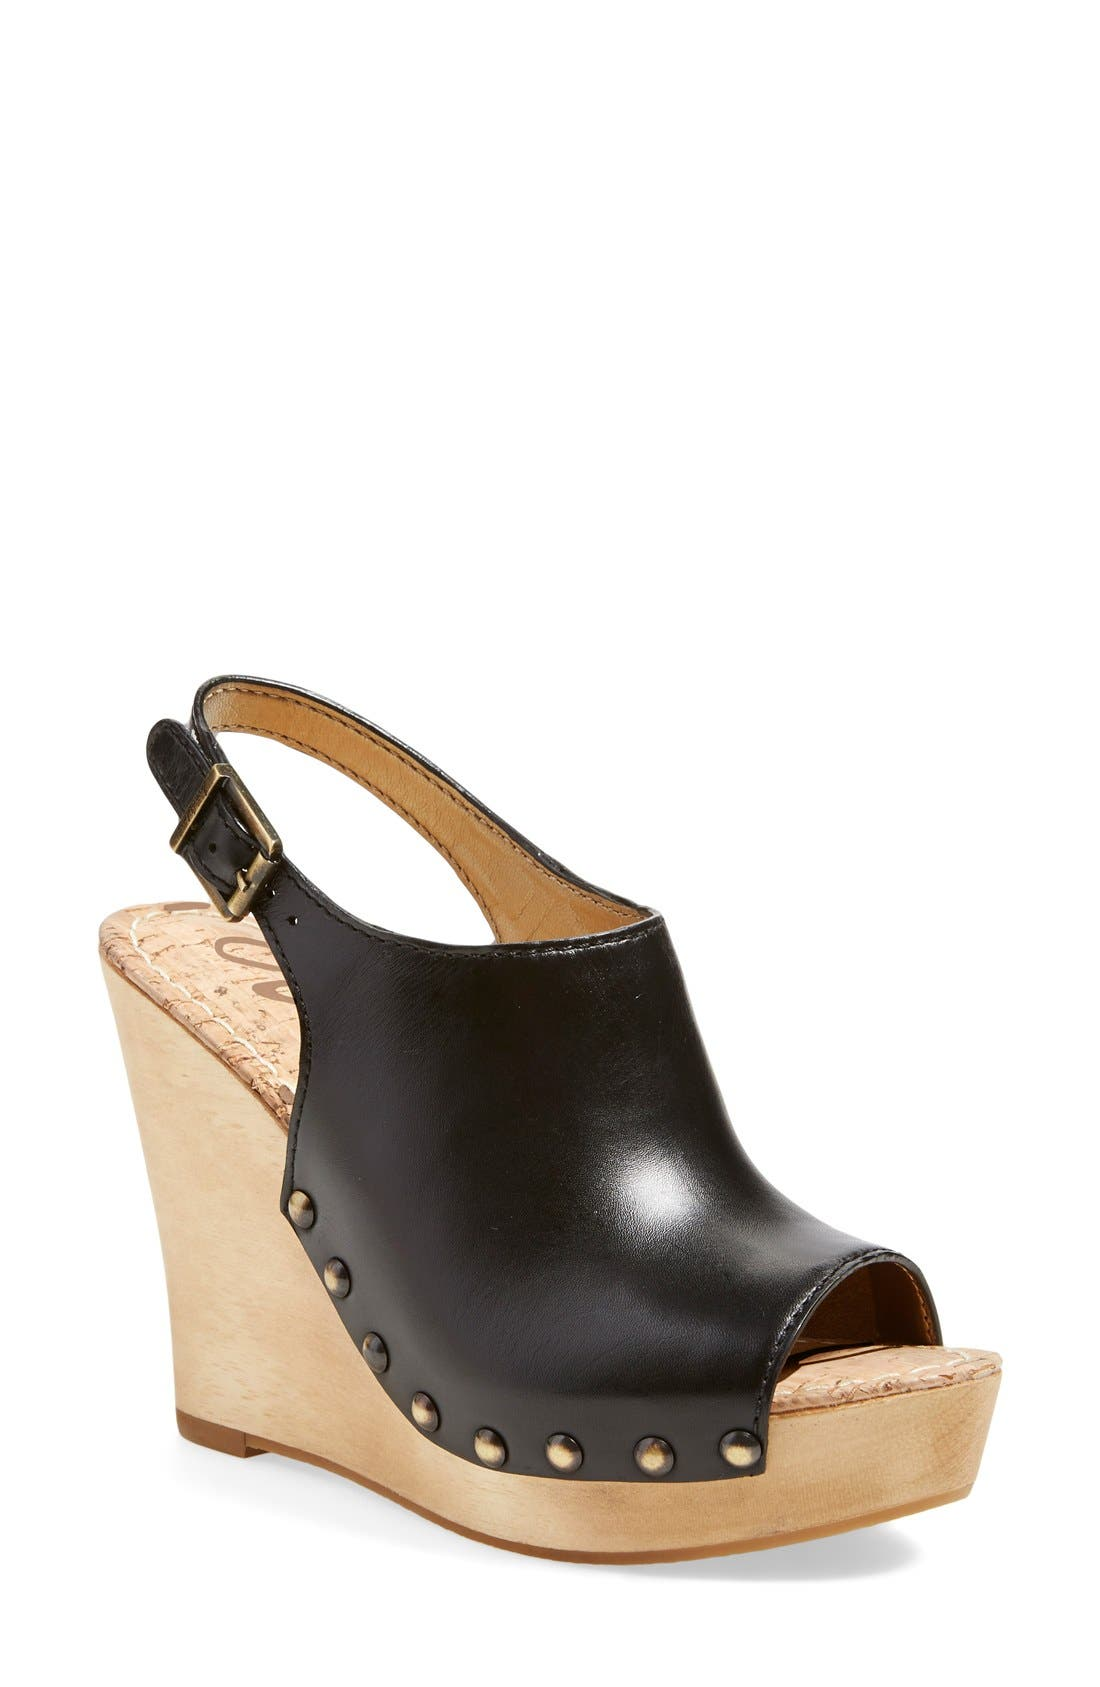 Alternate Image 1 Selected - Sam Edelman'Camilla' Wedge Sandal (Women)